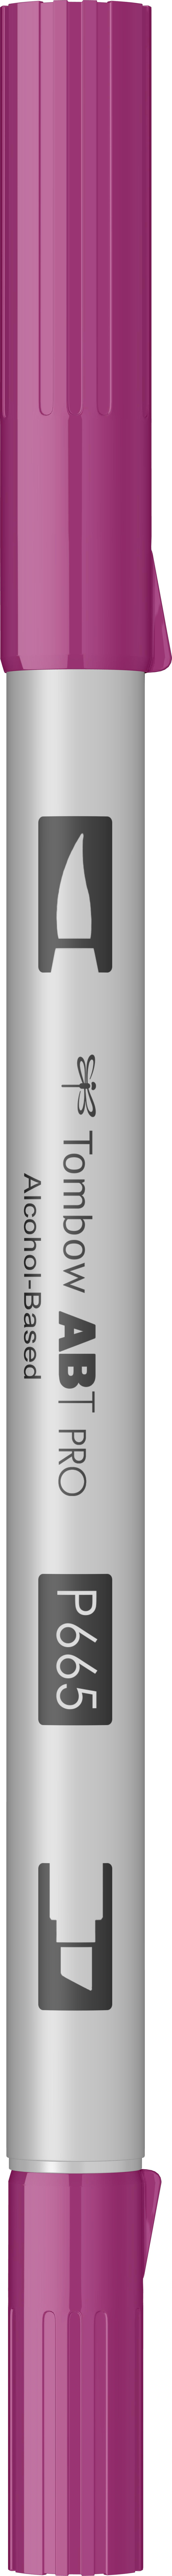 ABT Pro Tombow